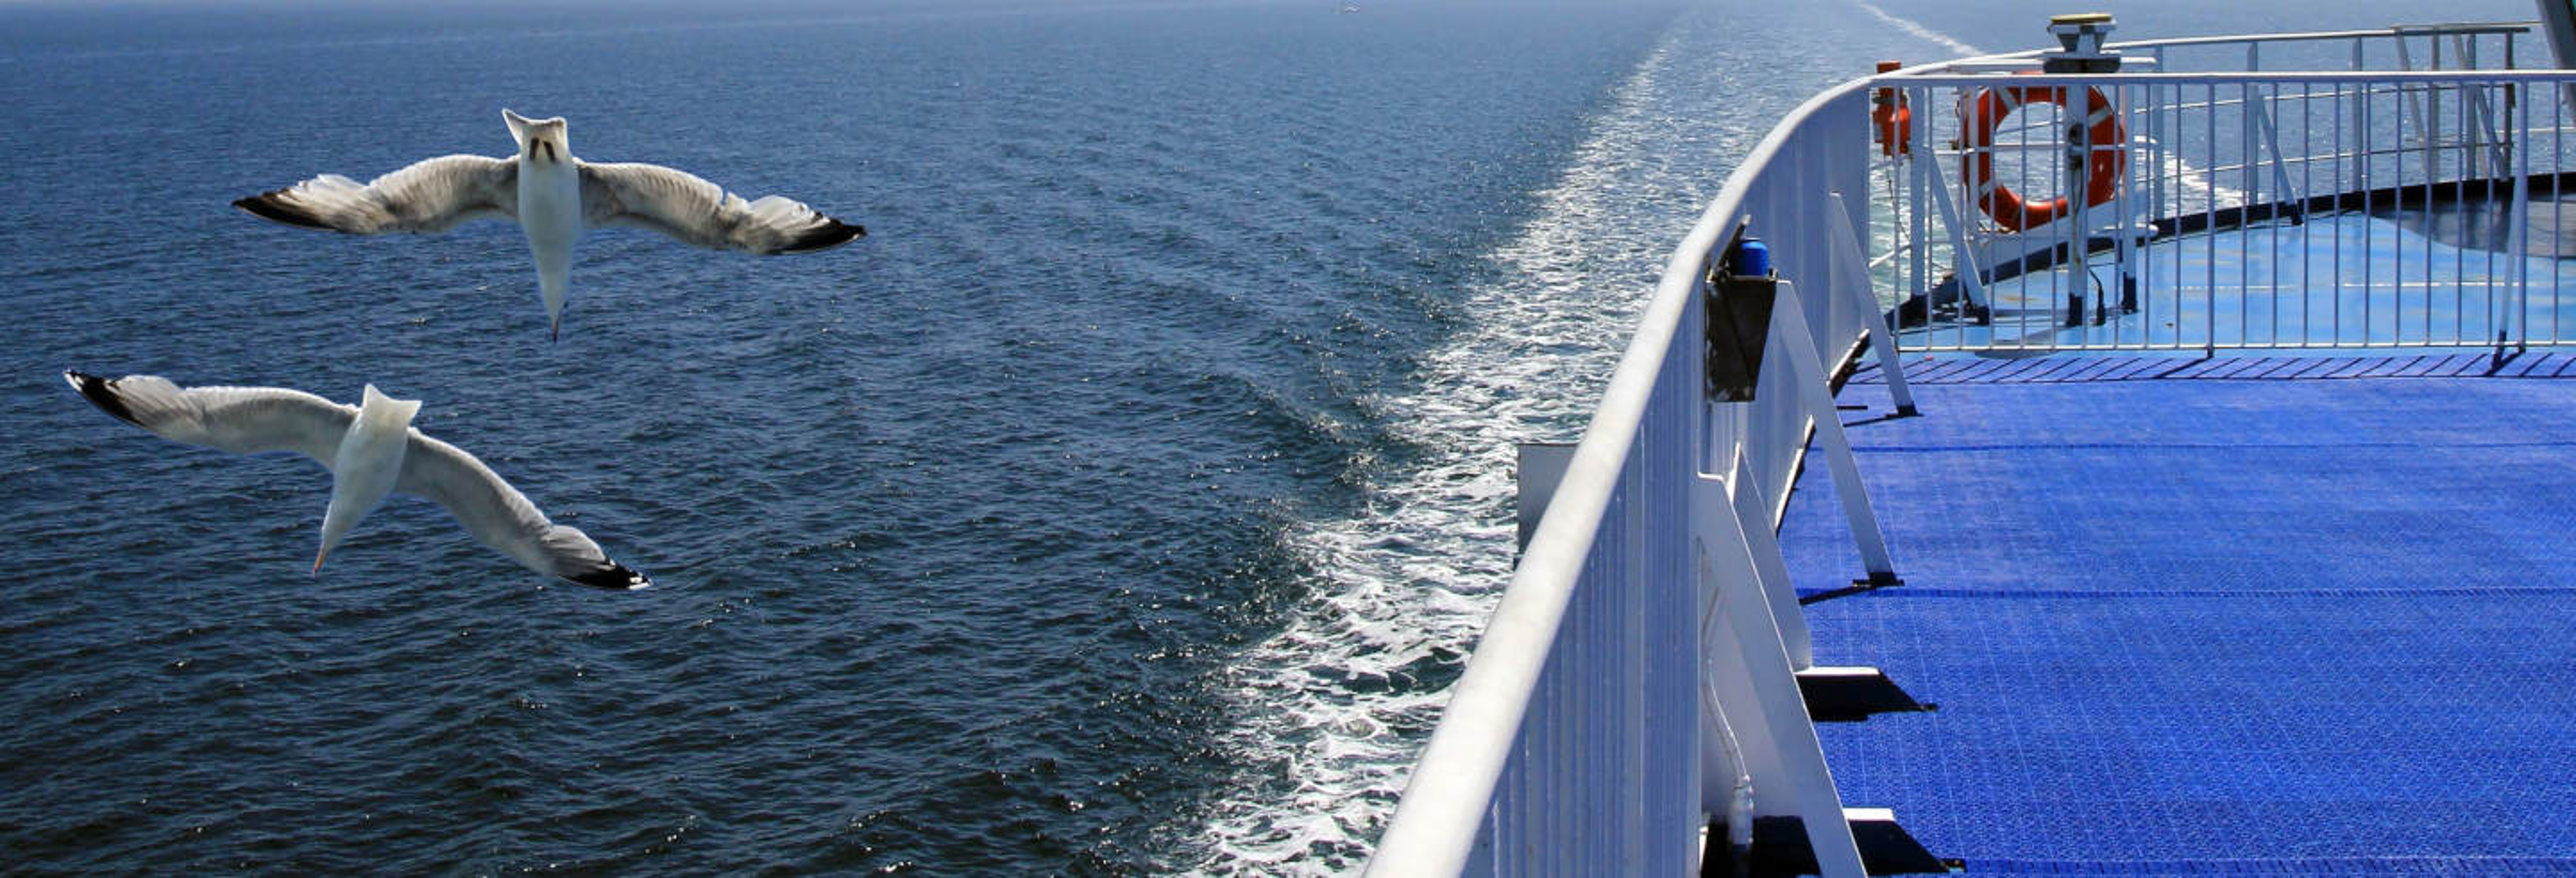 Barco a Formentera saindo de Playa d'en Bossa